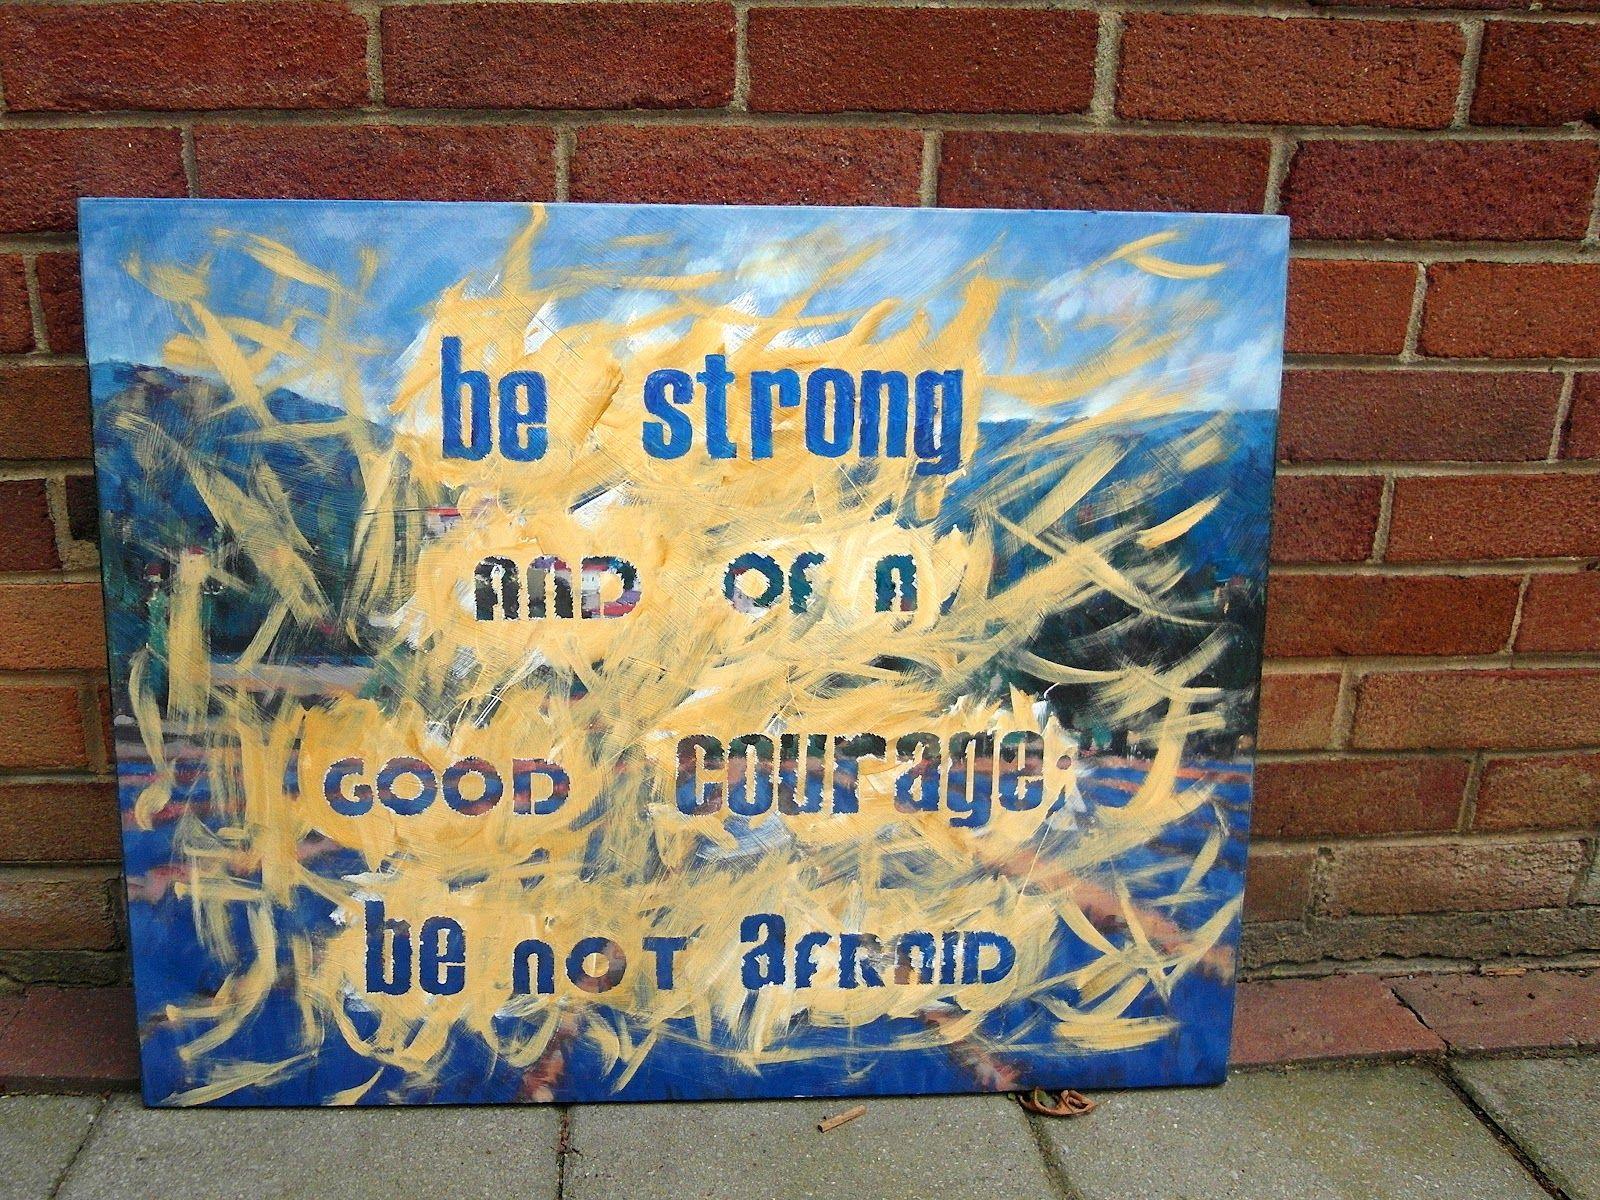 audacity of hope painting - Google Search | ArtWork | Pinterest ...